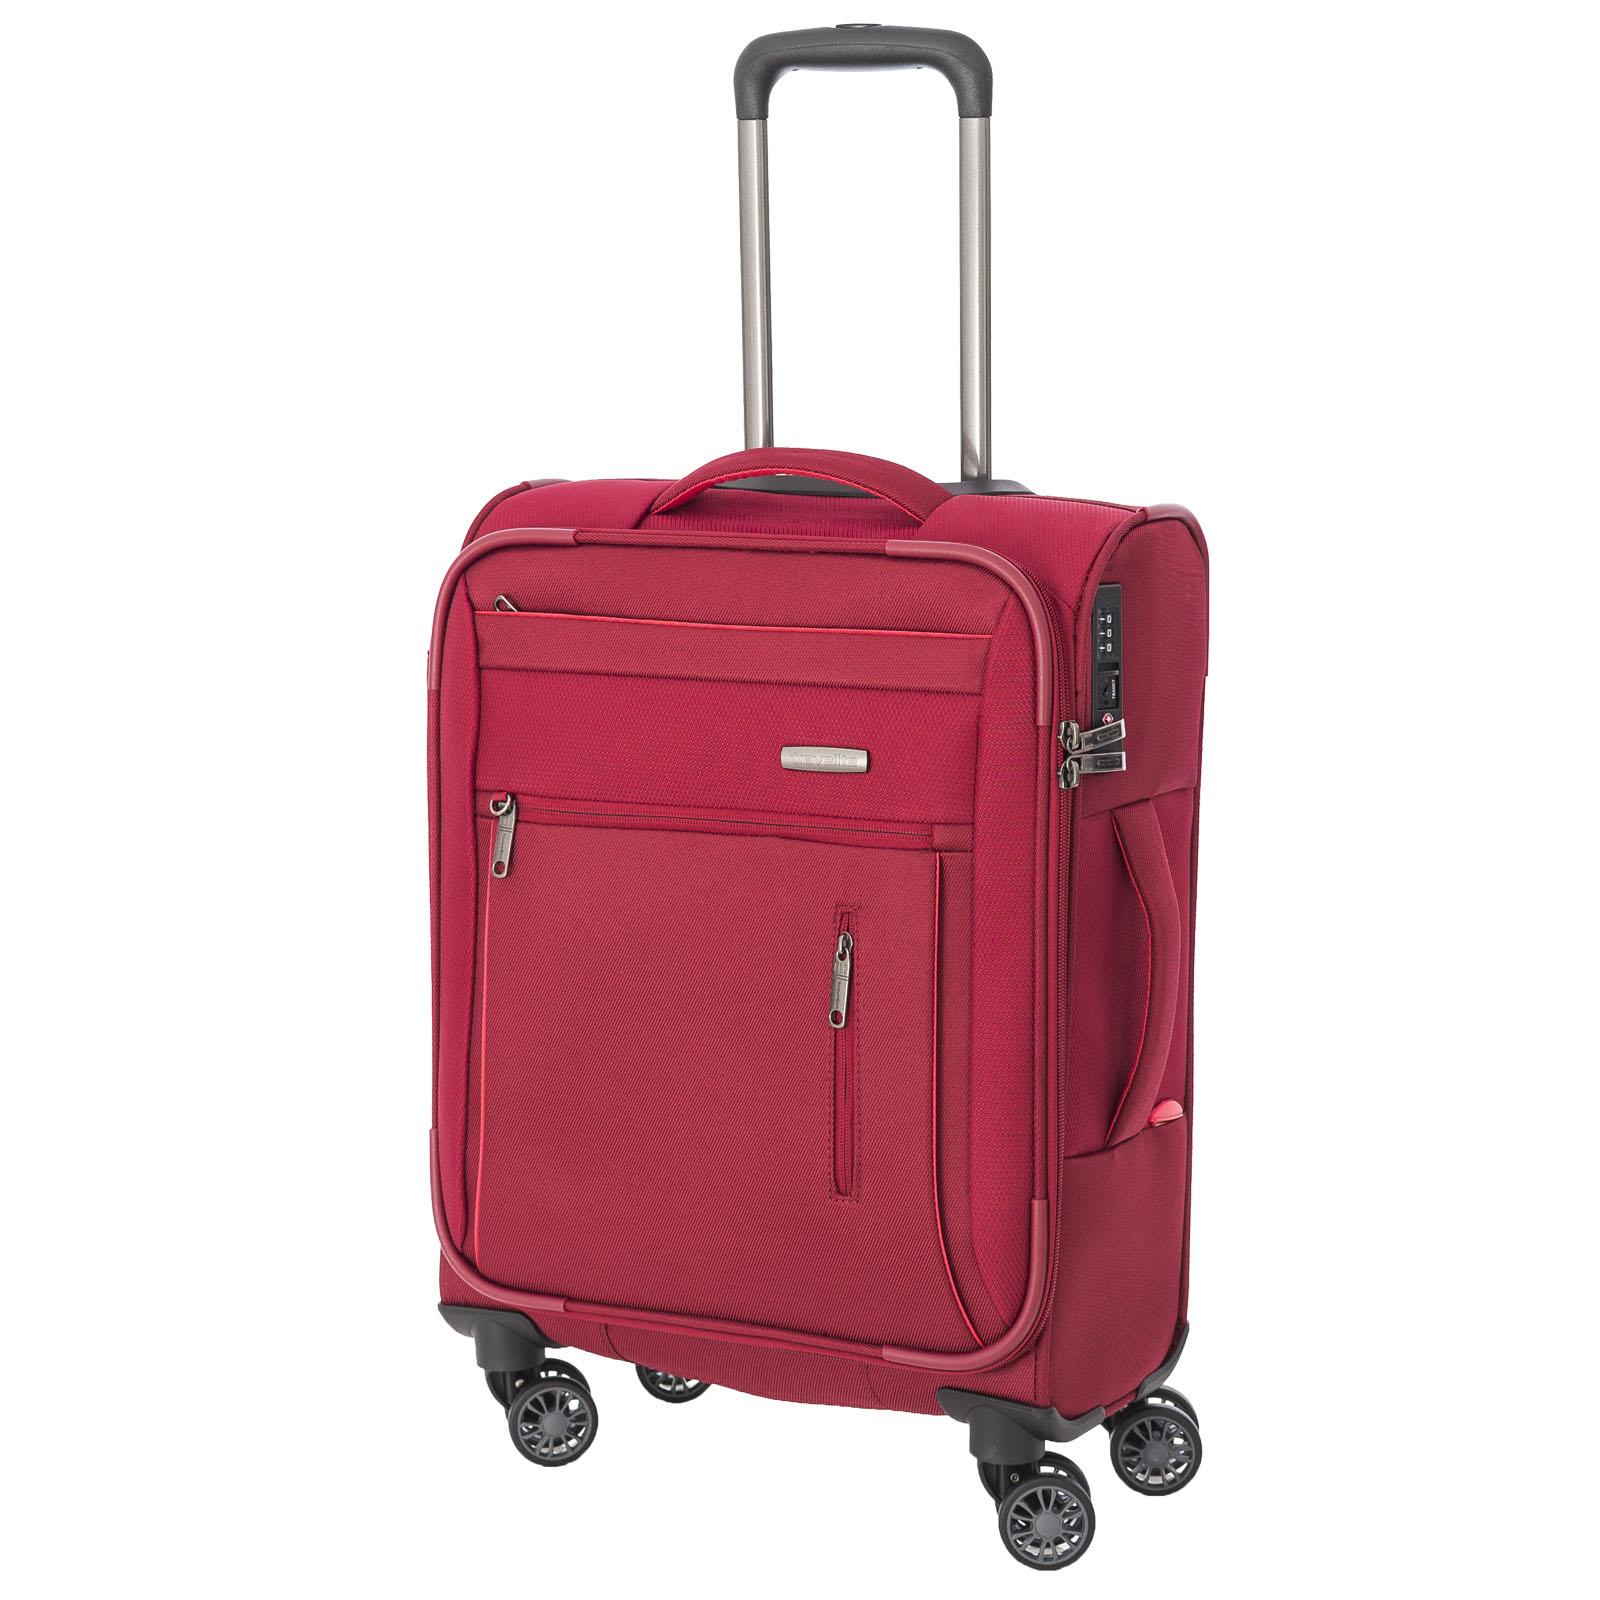 travelite-capri-rot-55cm-handgepack-stoff-trolley